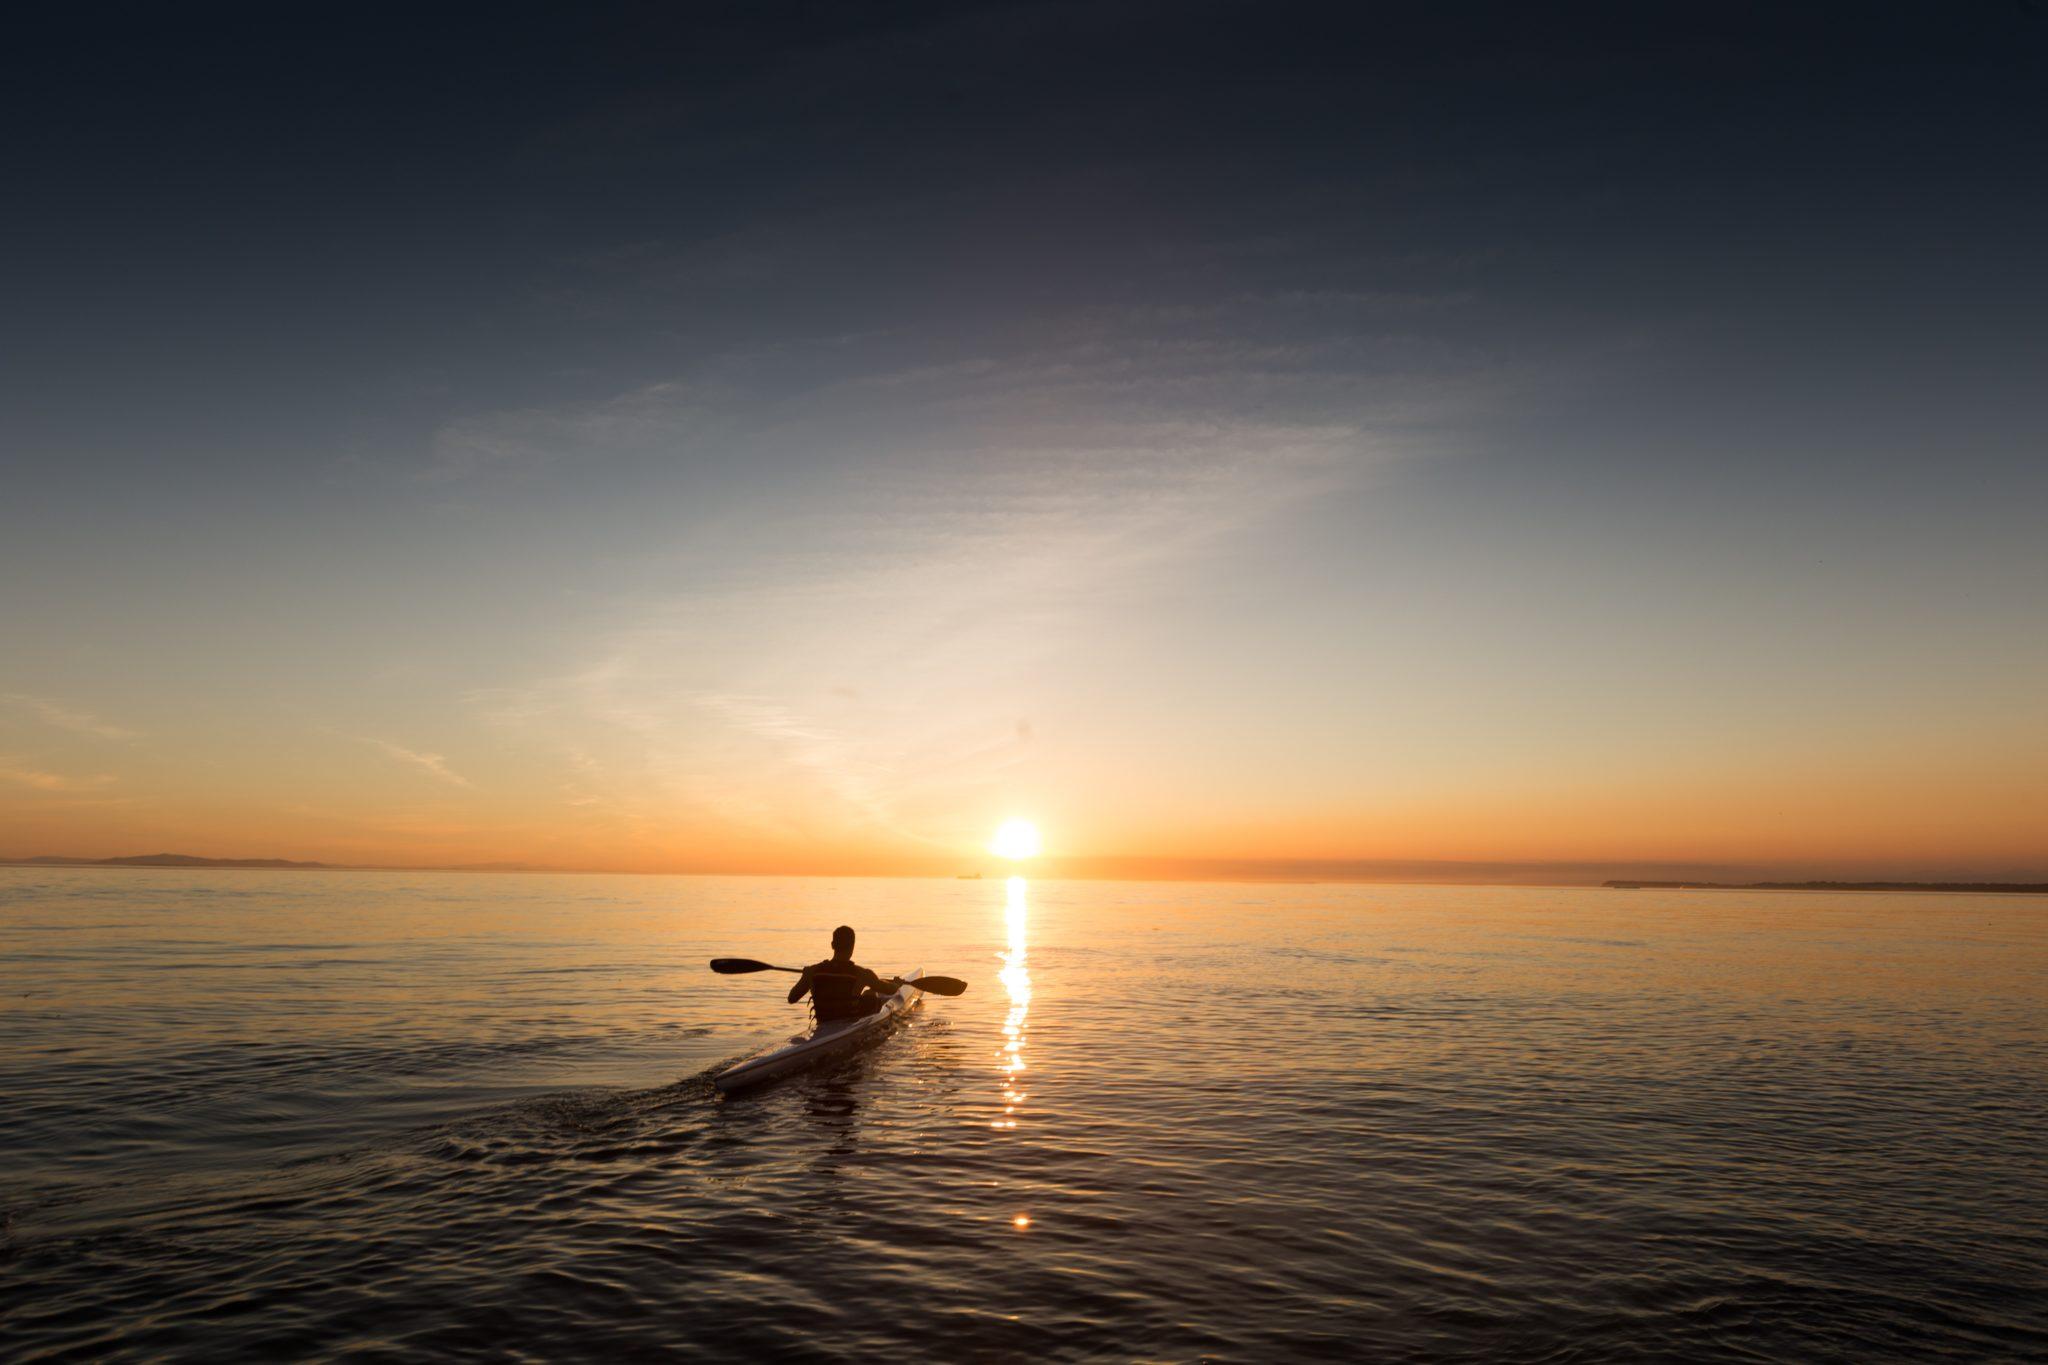 kayak rentals, paddle board rental